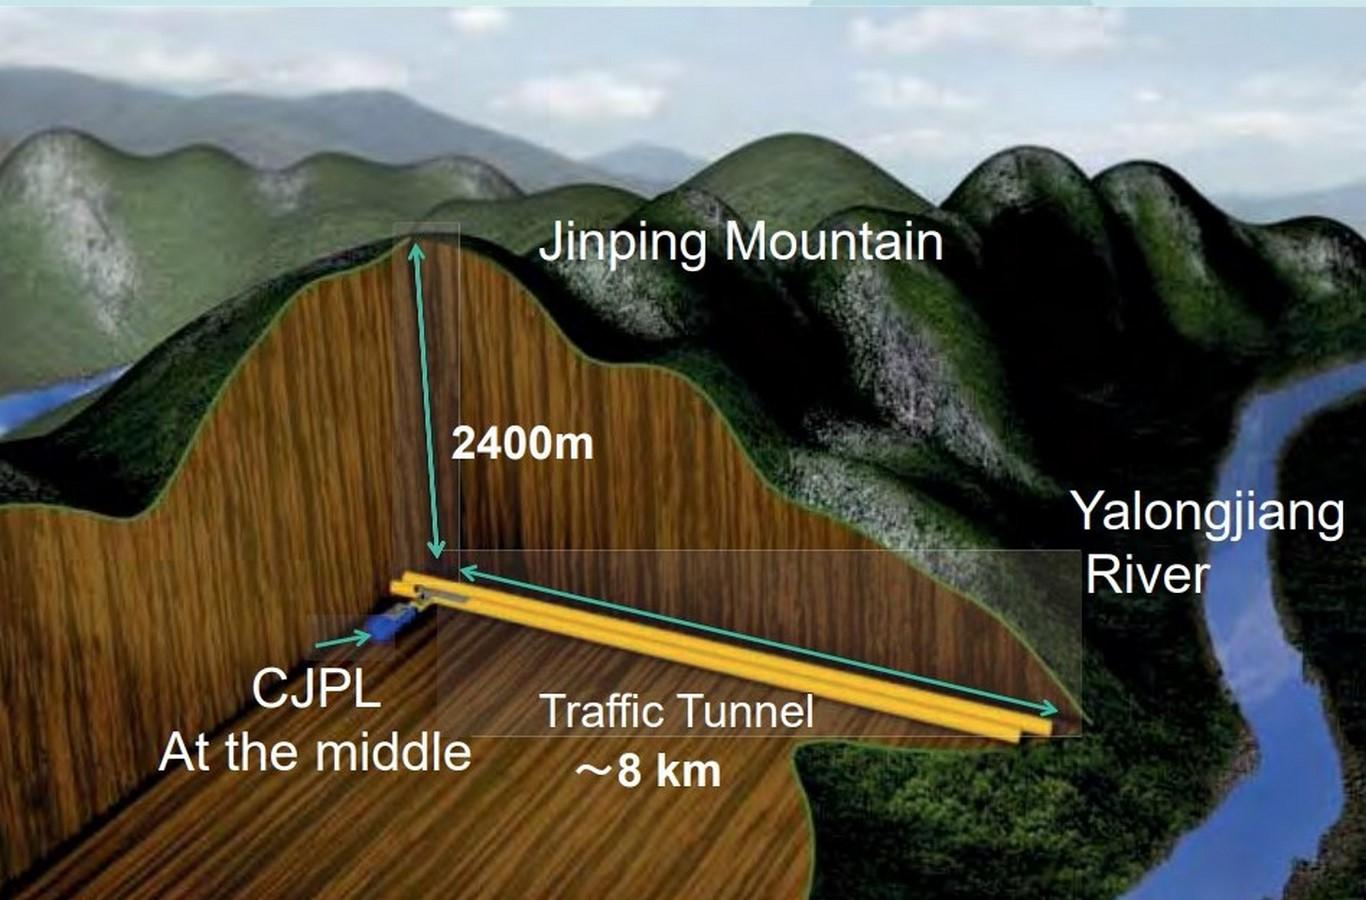 Jinping Underground Laboratory, China- The world deepest underground laboratory - Sheet1